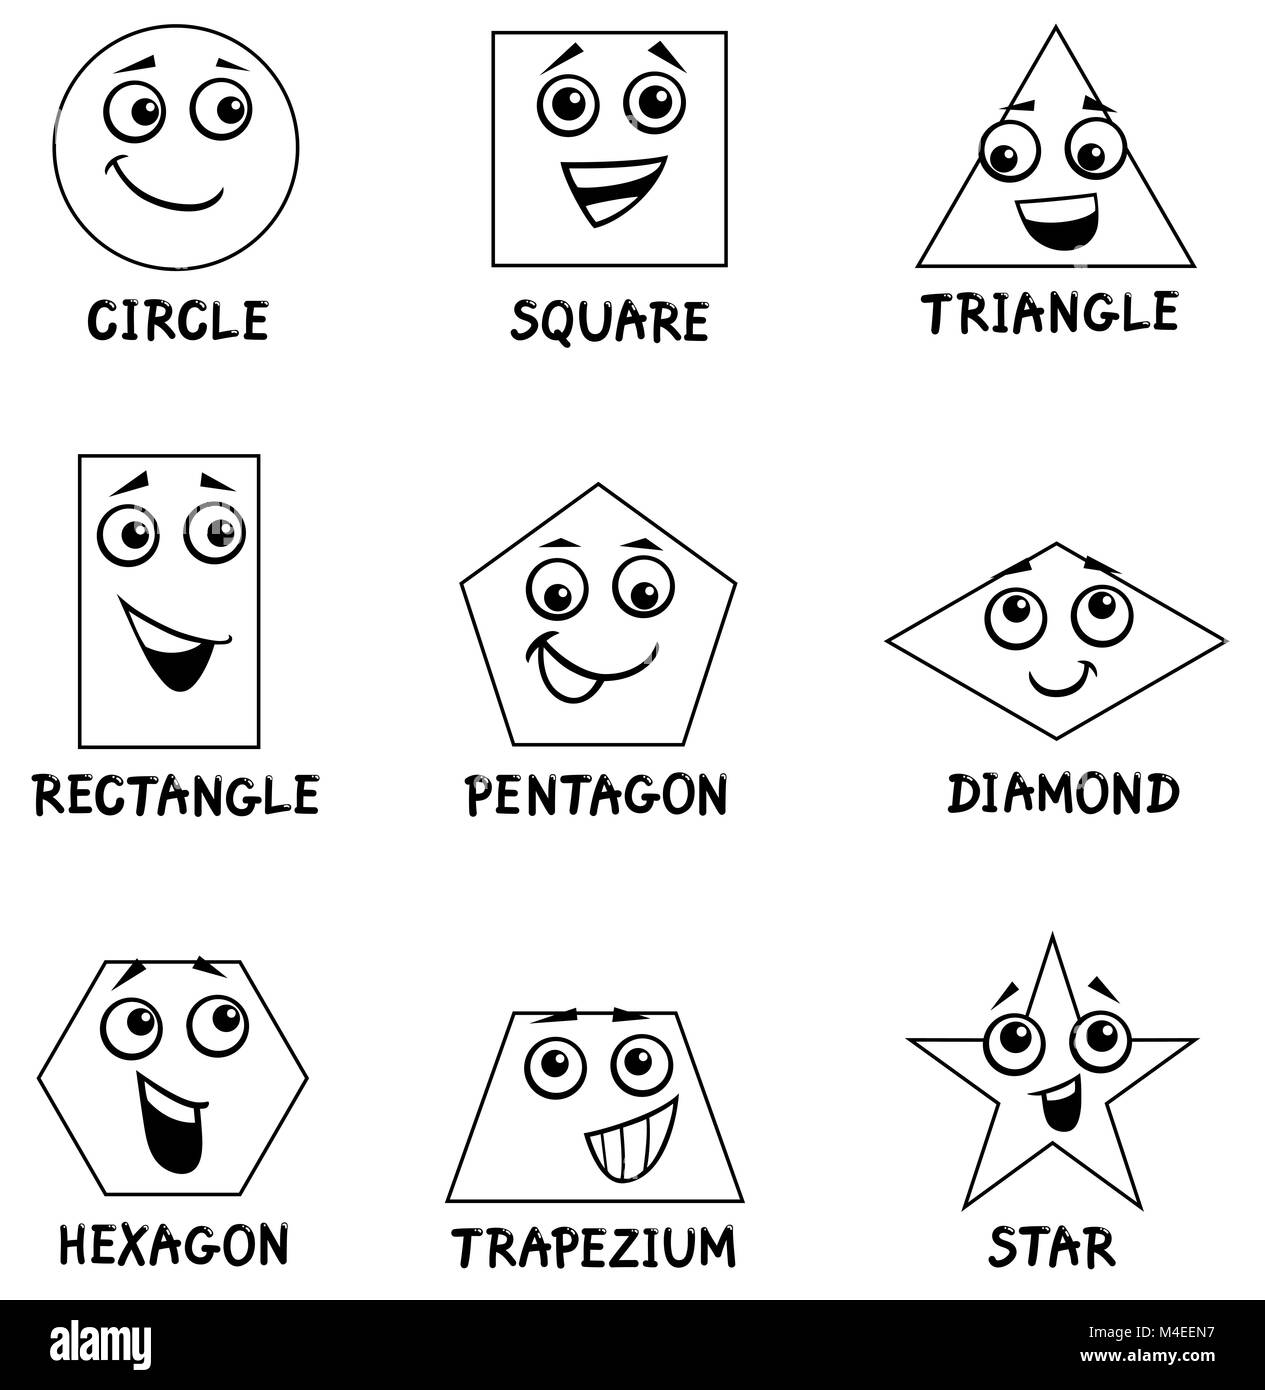 Libro Para Colorear De Formas Geometricas Fotografia De